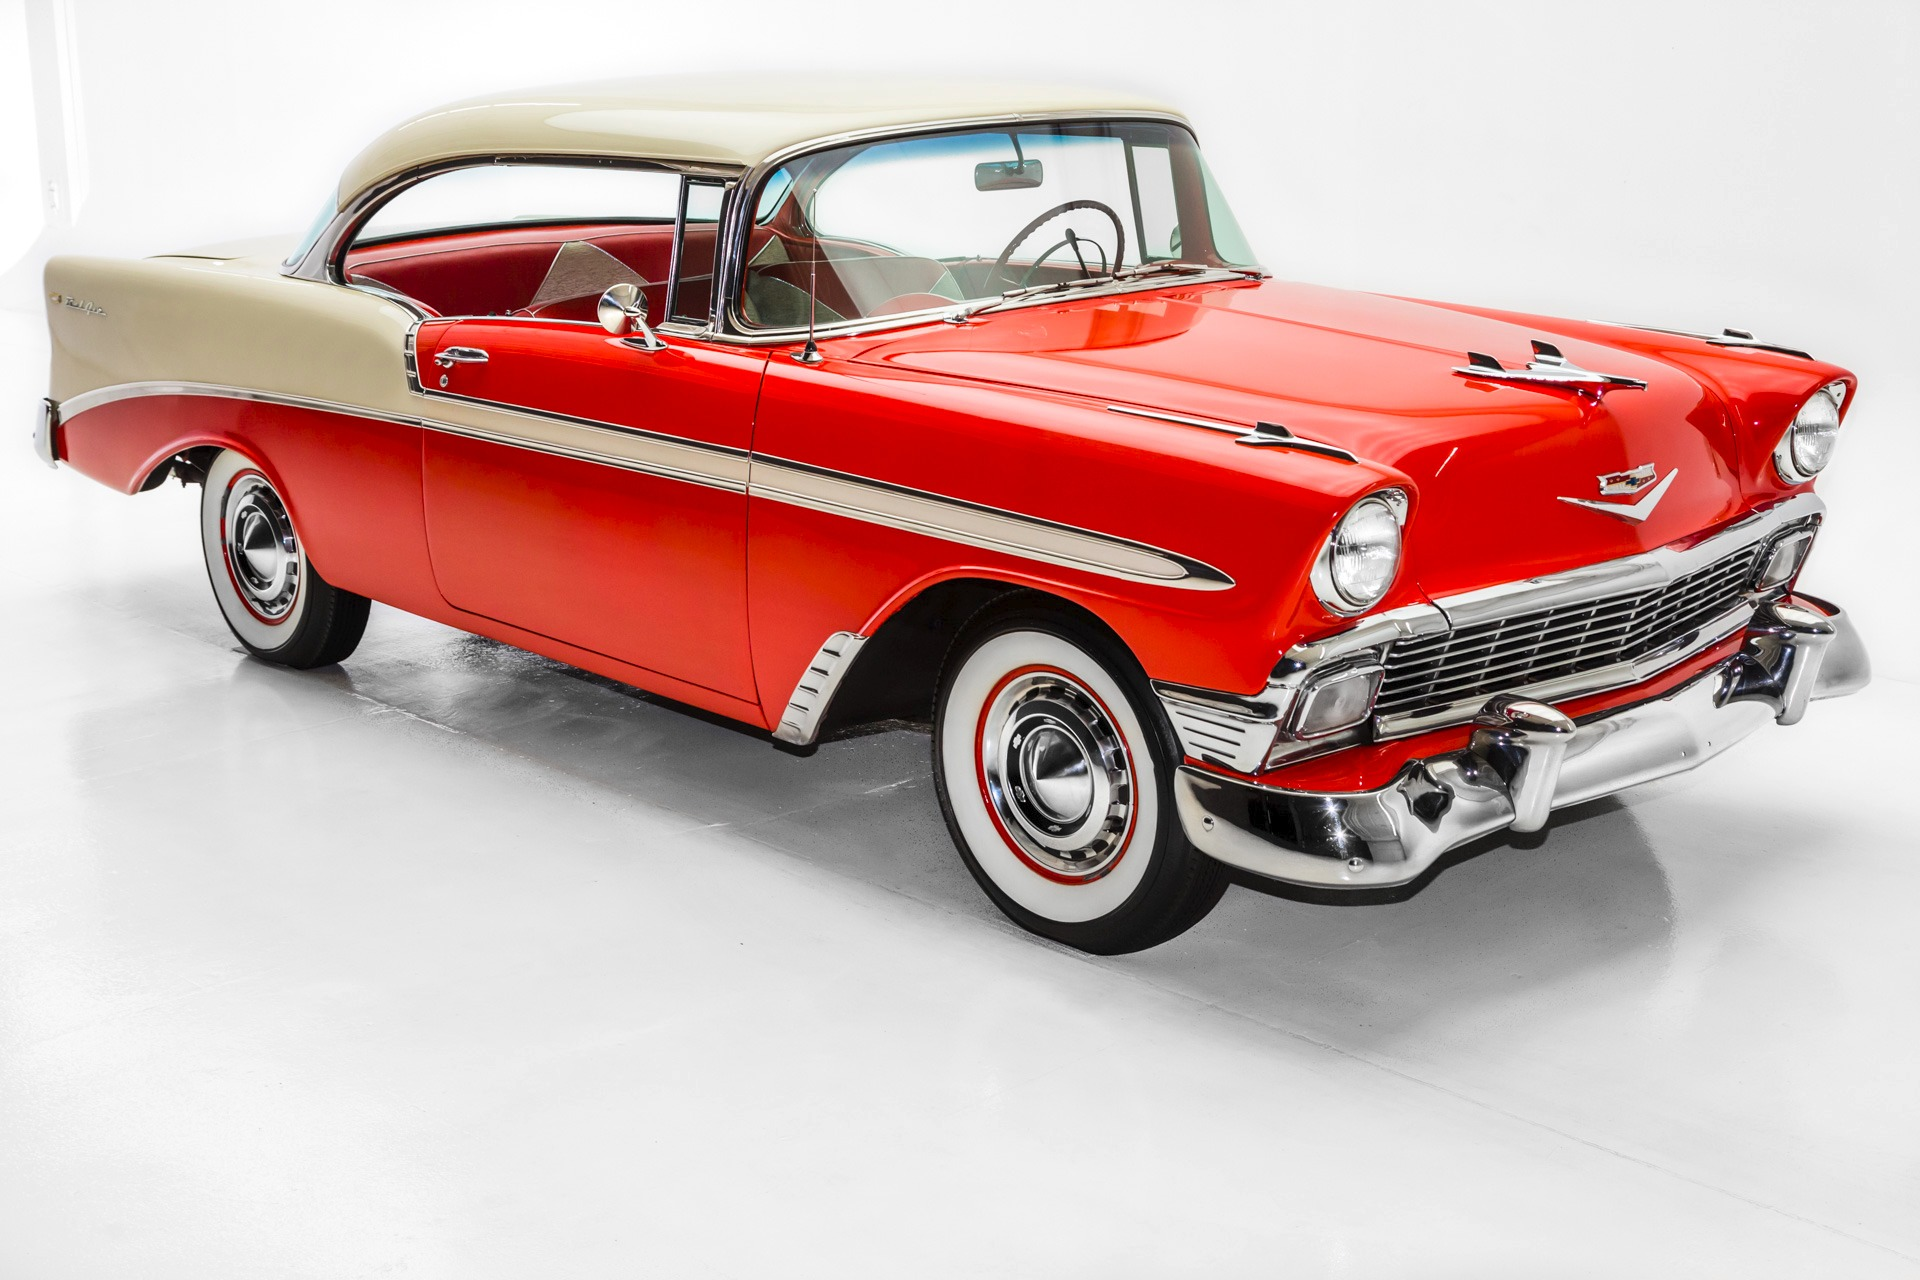 1956 chevrolet bel air v8 auto amazing car. Black Bedroom Furniture Sets. Home Design Ideas